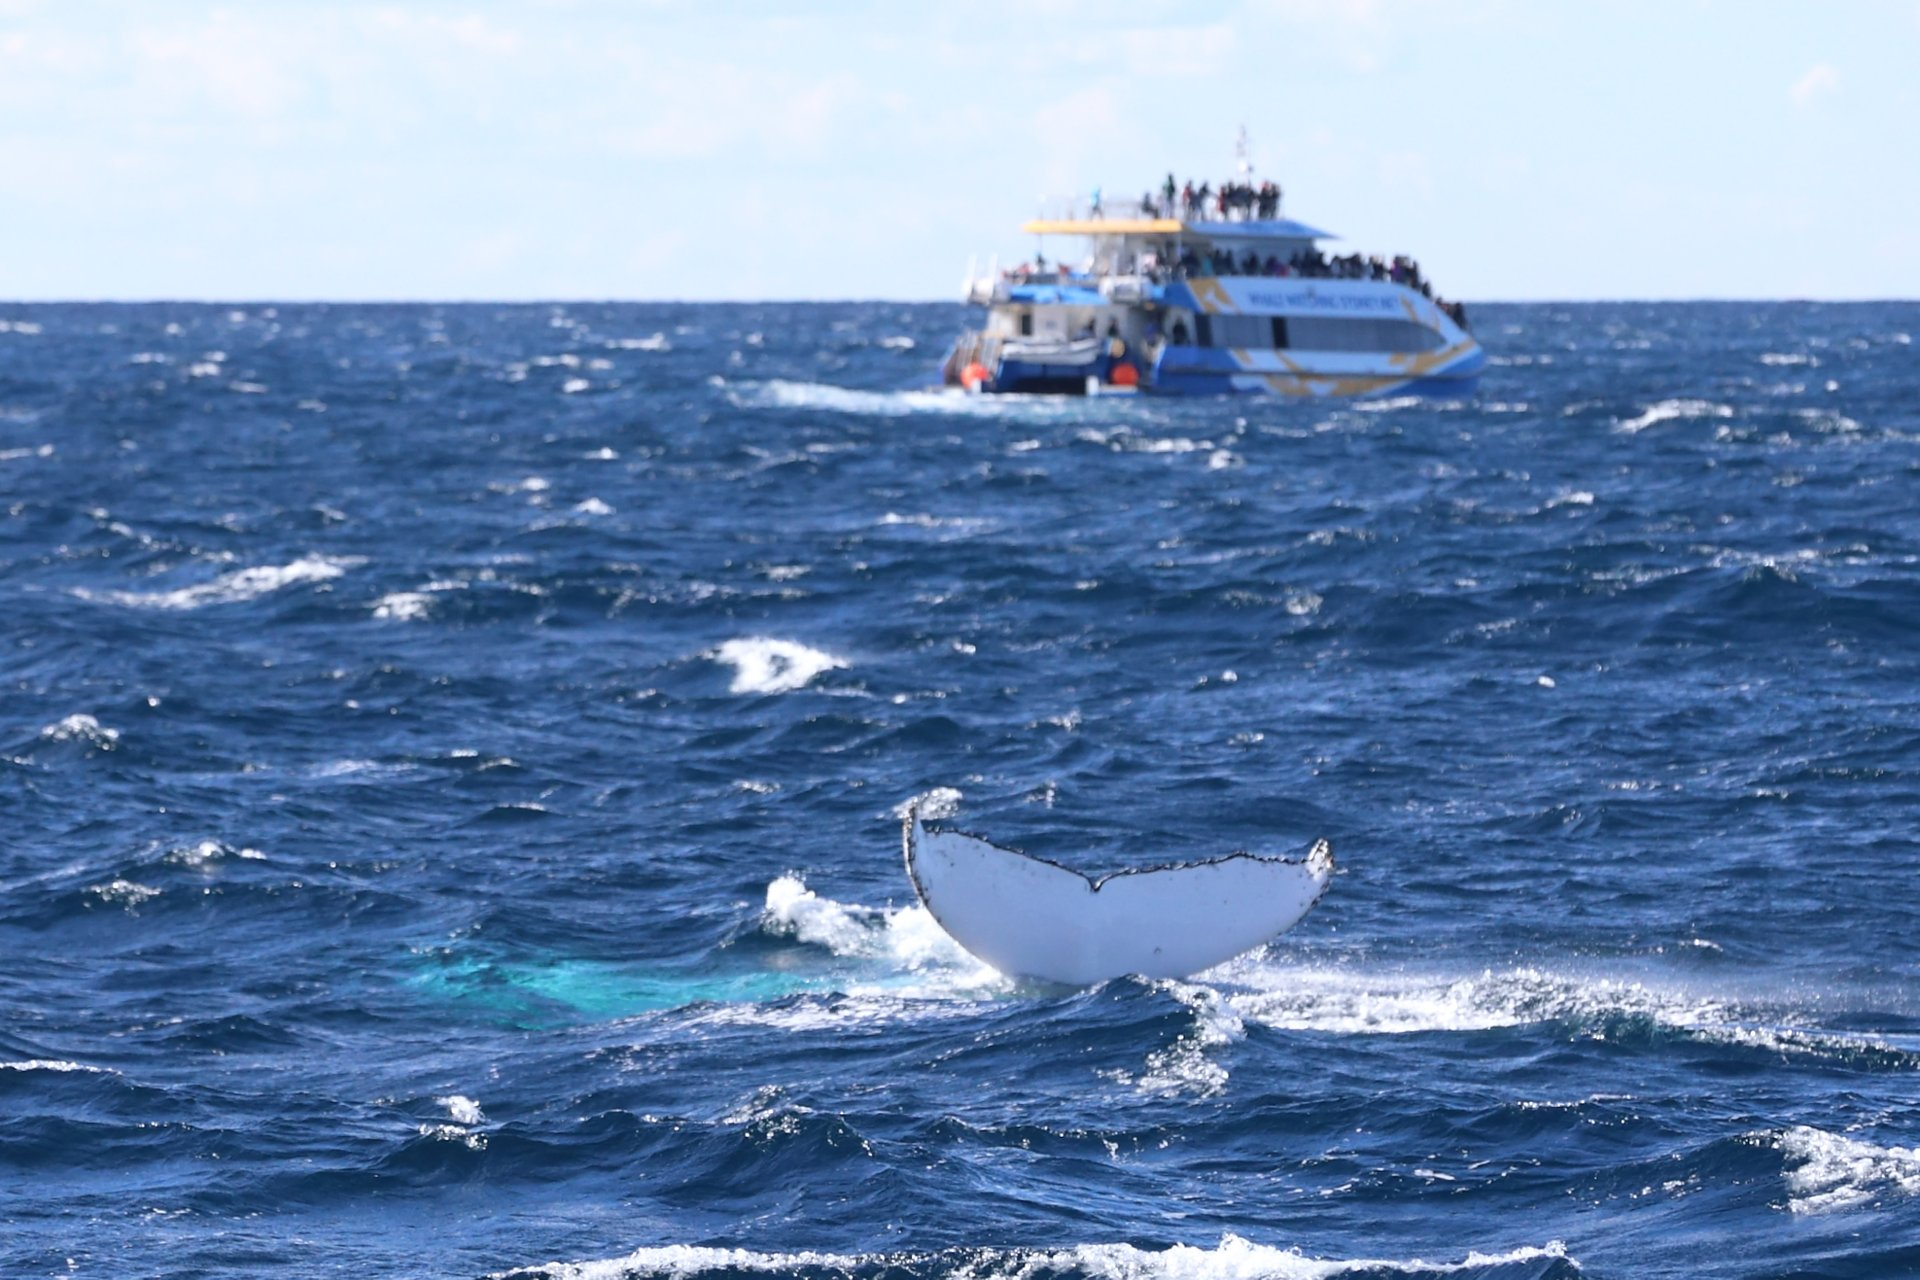 Whale & Dolphin Watching in Sydney - Best Season 2019